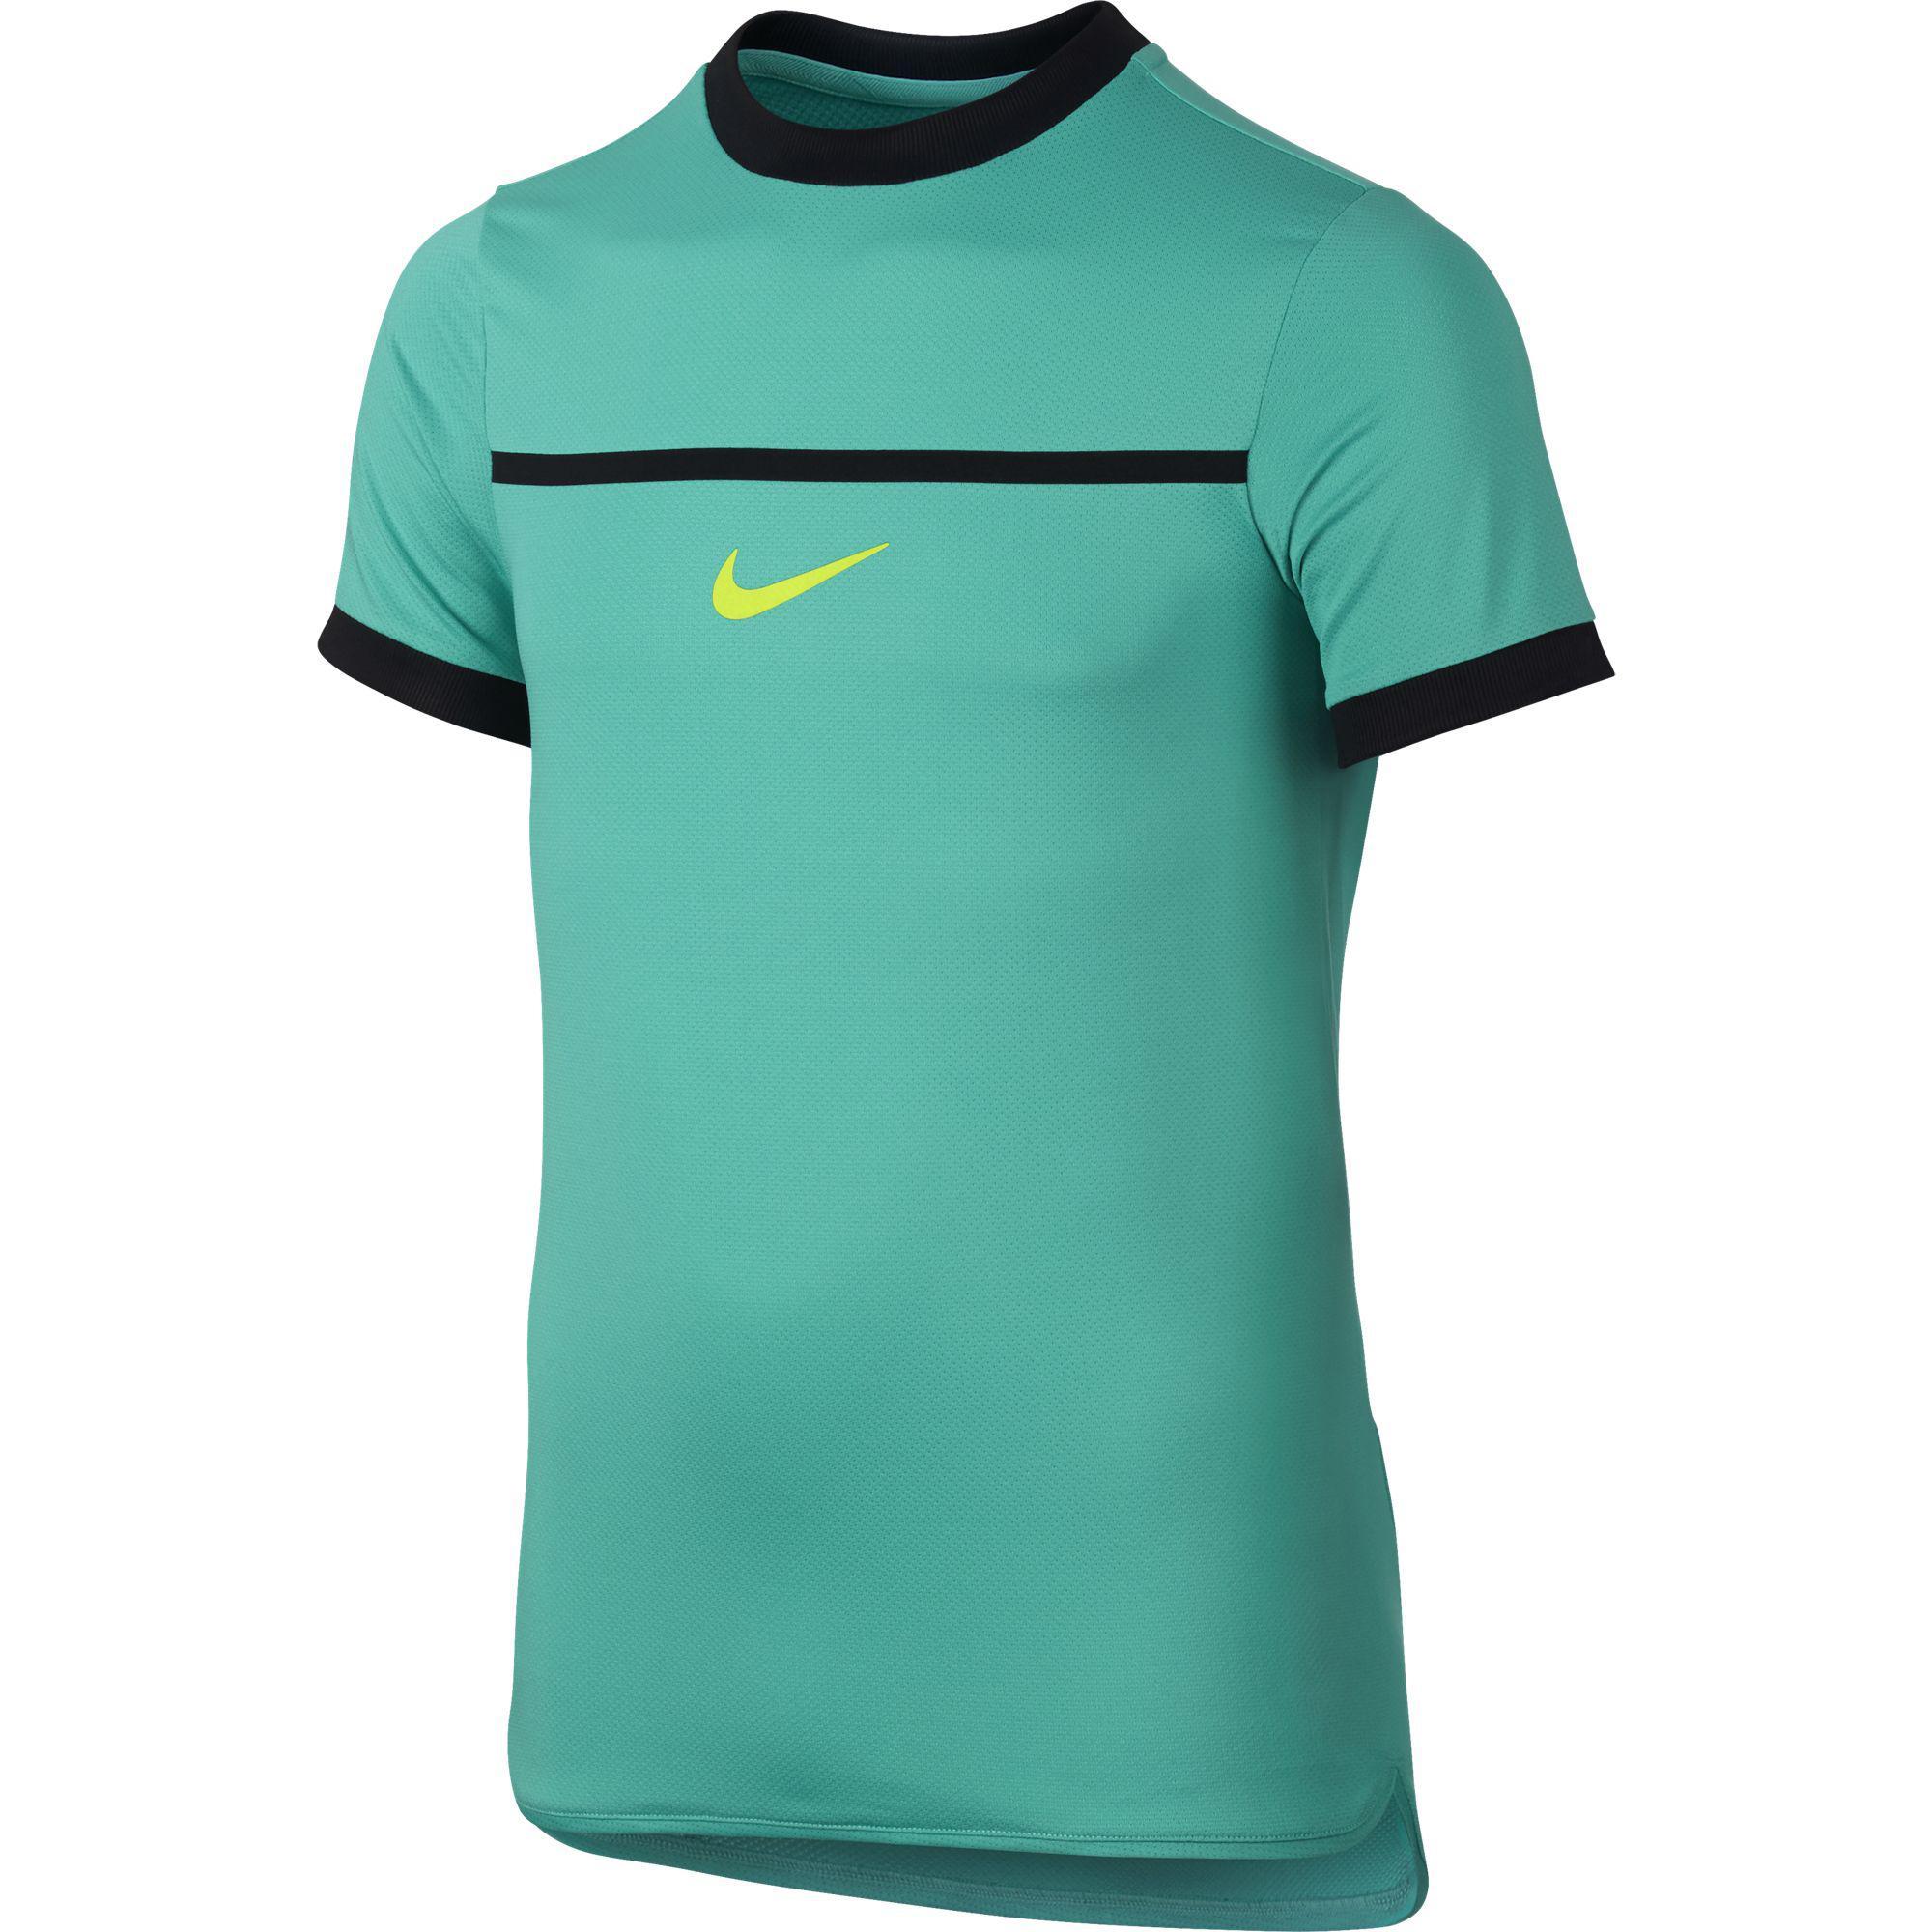 sale retailer f84aa ef4f8 Nike Boys Challenger Premier Rafa Crew - Hyper JadeBlack - Tennisnuts.com